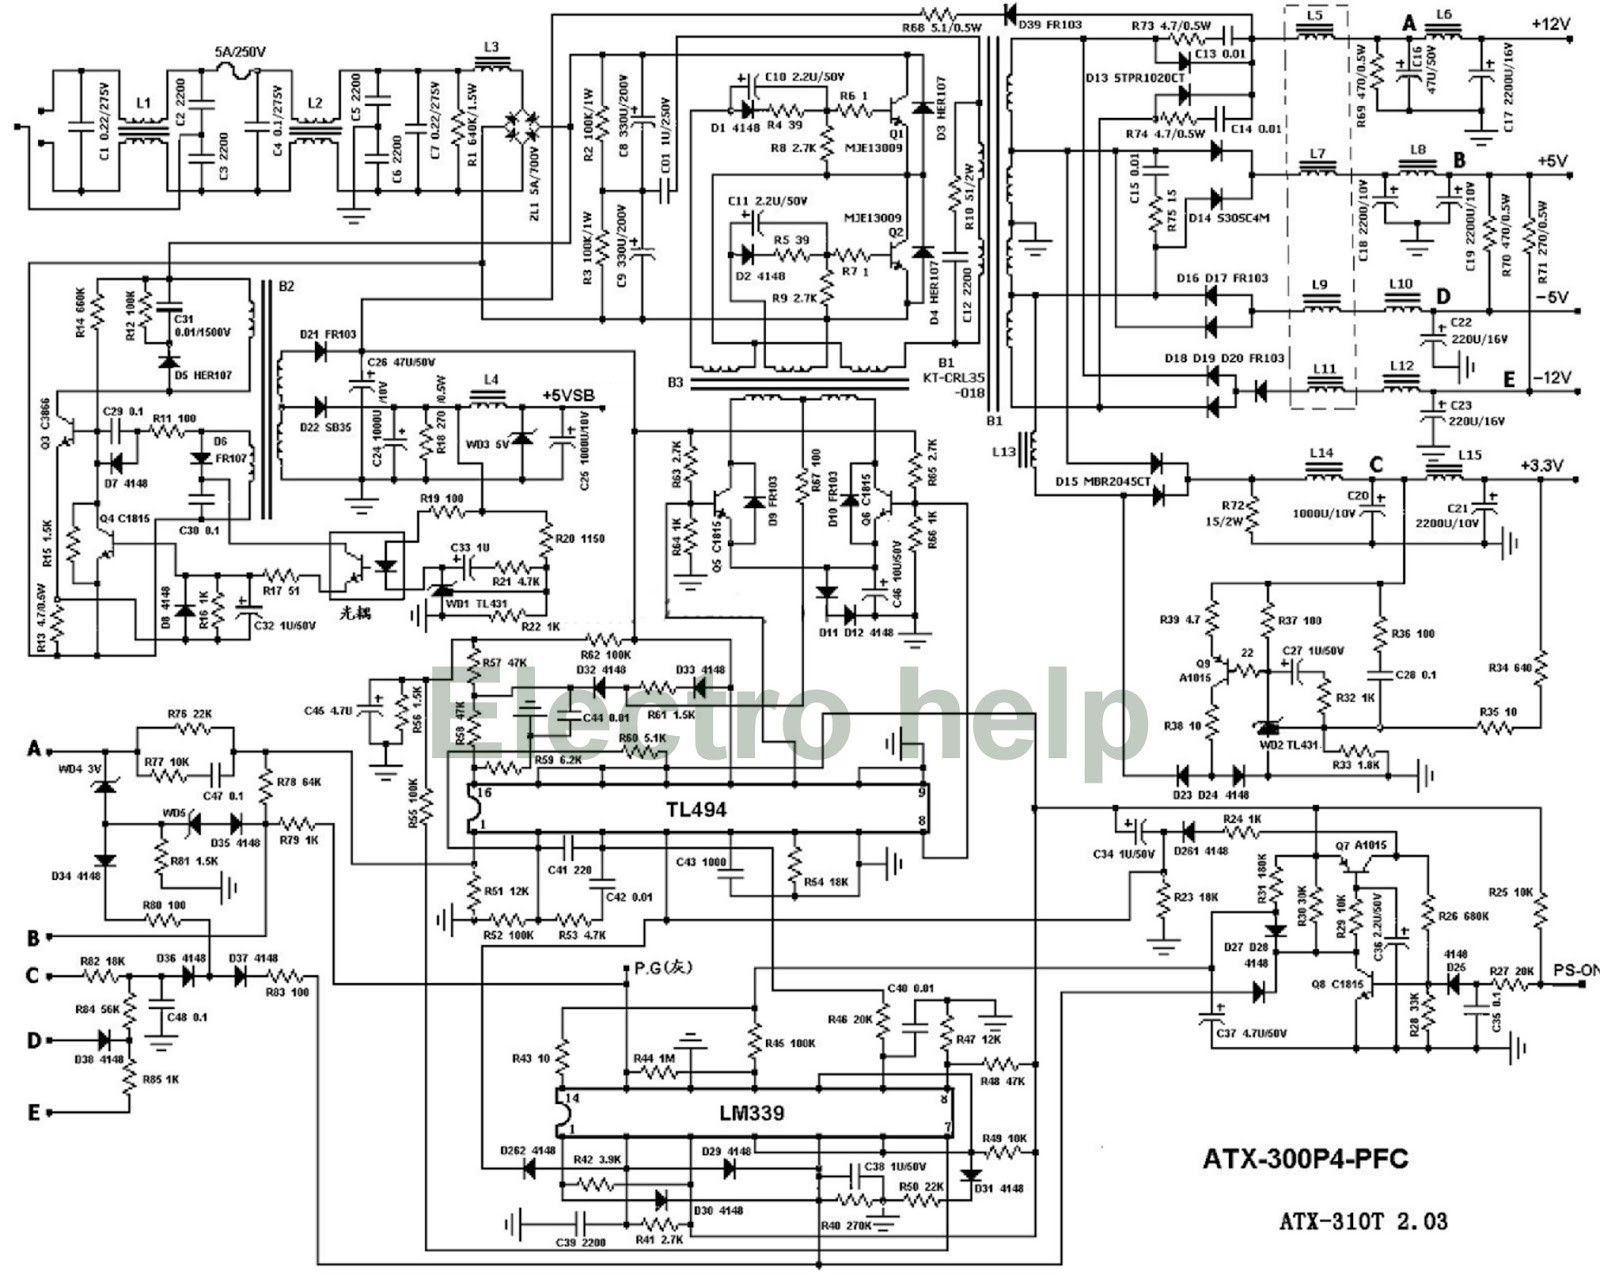 Computer Power Cord Wiring Diagram Electrical Diagrams Bestec Atx 250 12z Schematic Wire Data Schema U2022